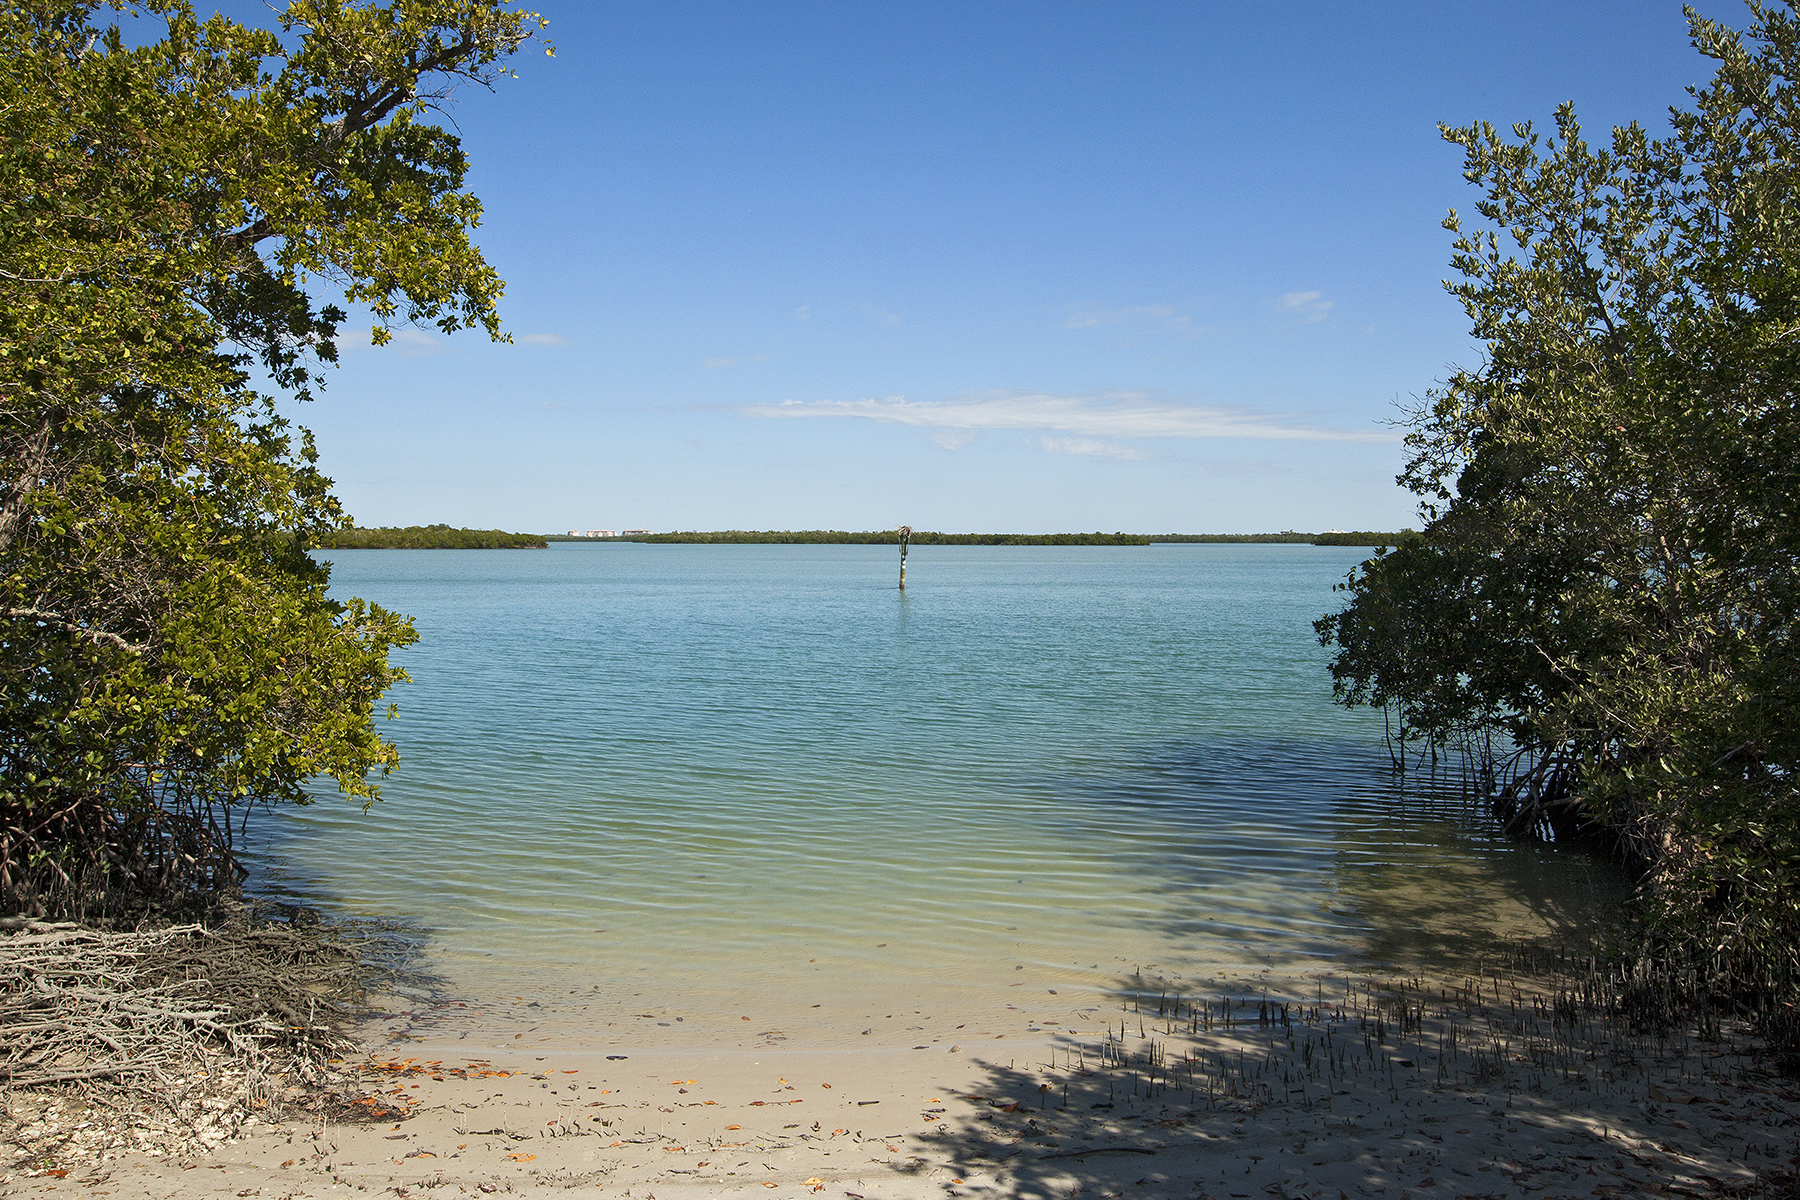 Terreno para Venda às KEY MARCO - MARCO ISLAND 1255 Bluehill Creek Dr Marco Island, Florida, 34145 Estados Unidos